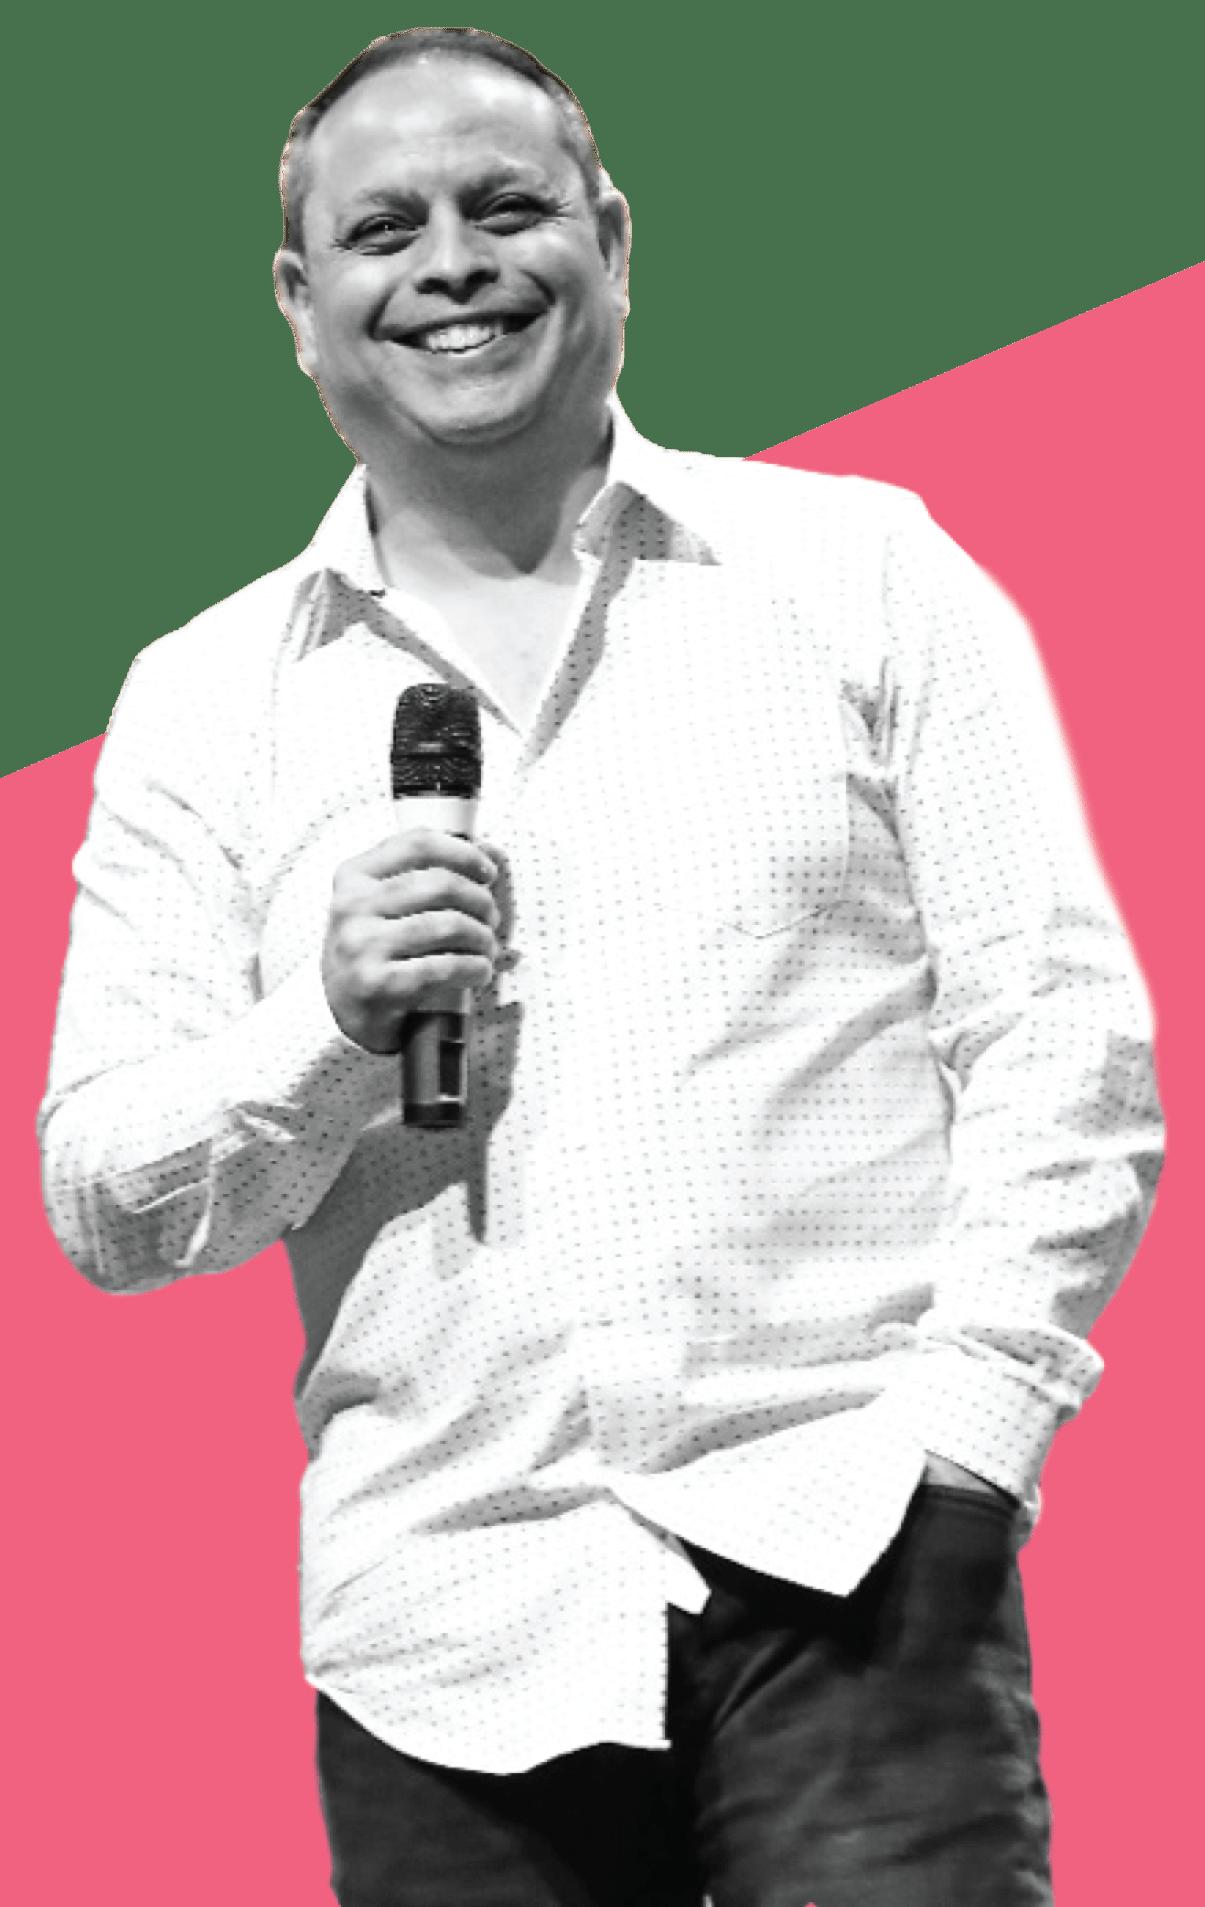 Mike Filsaime, CEO & Co-Founder, GrooveDigital